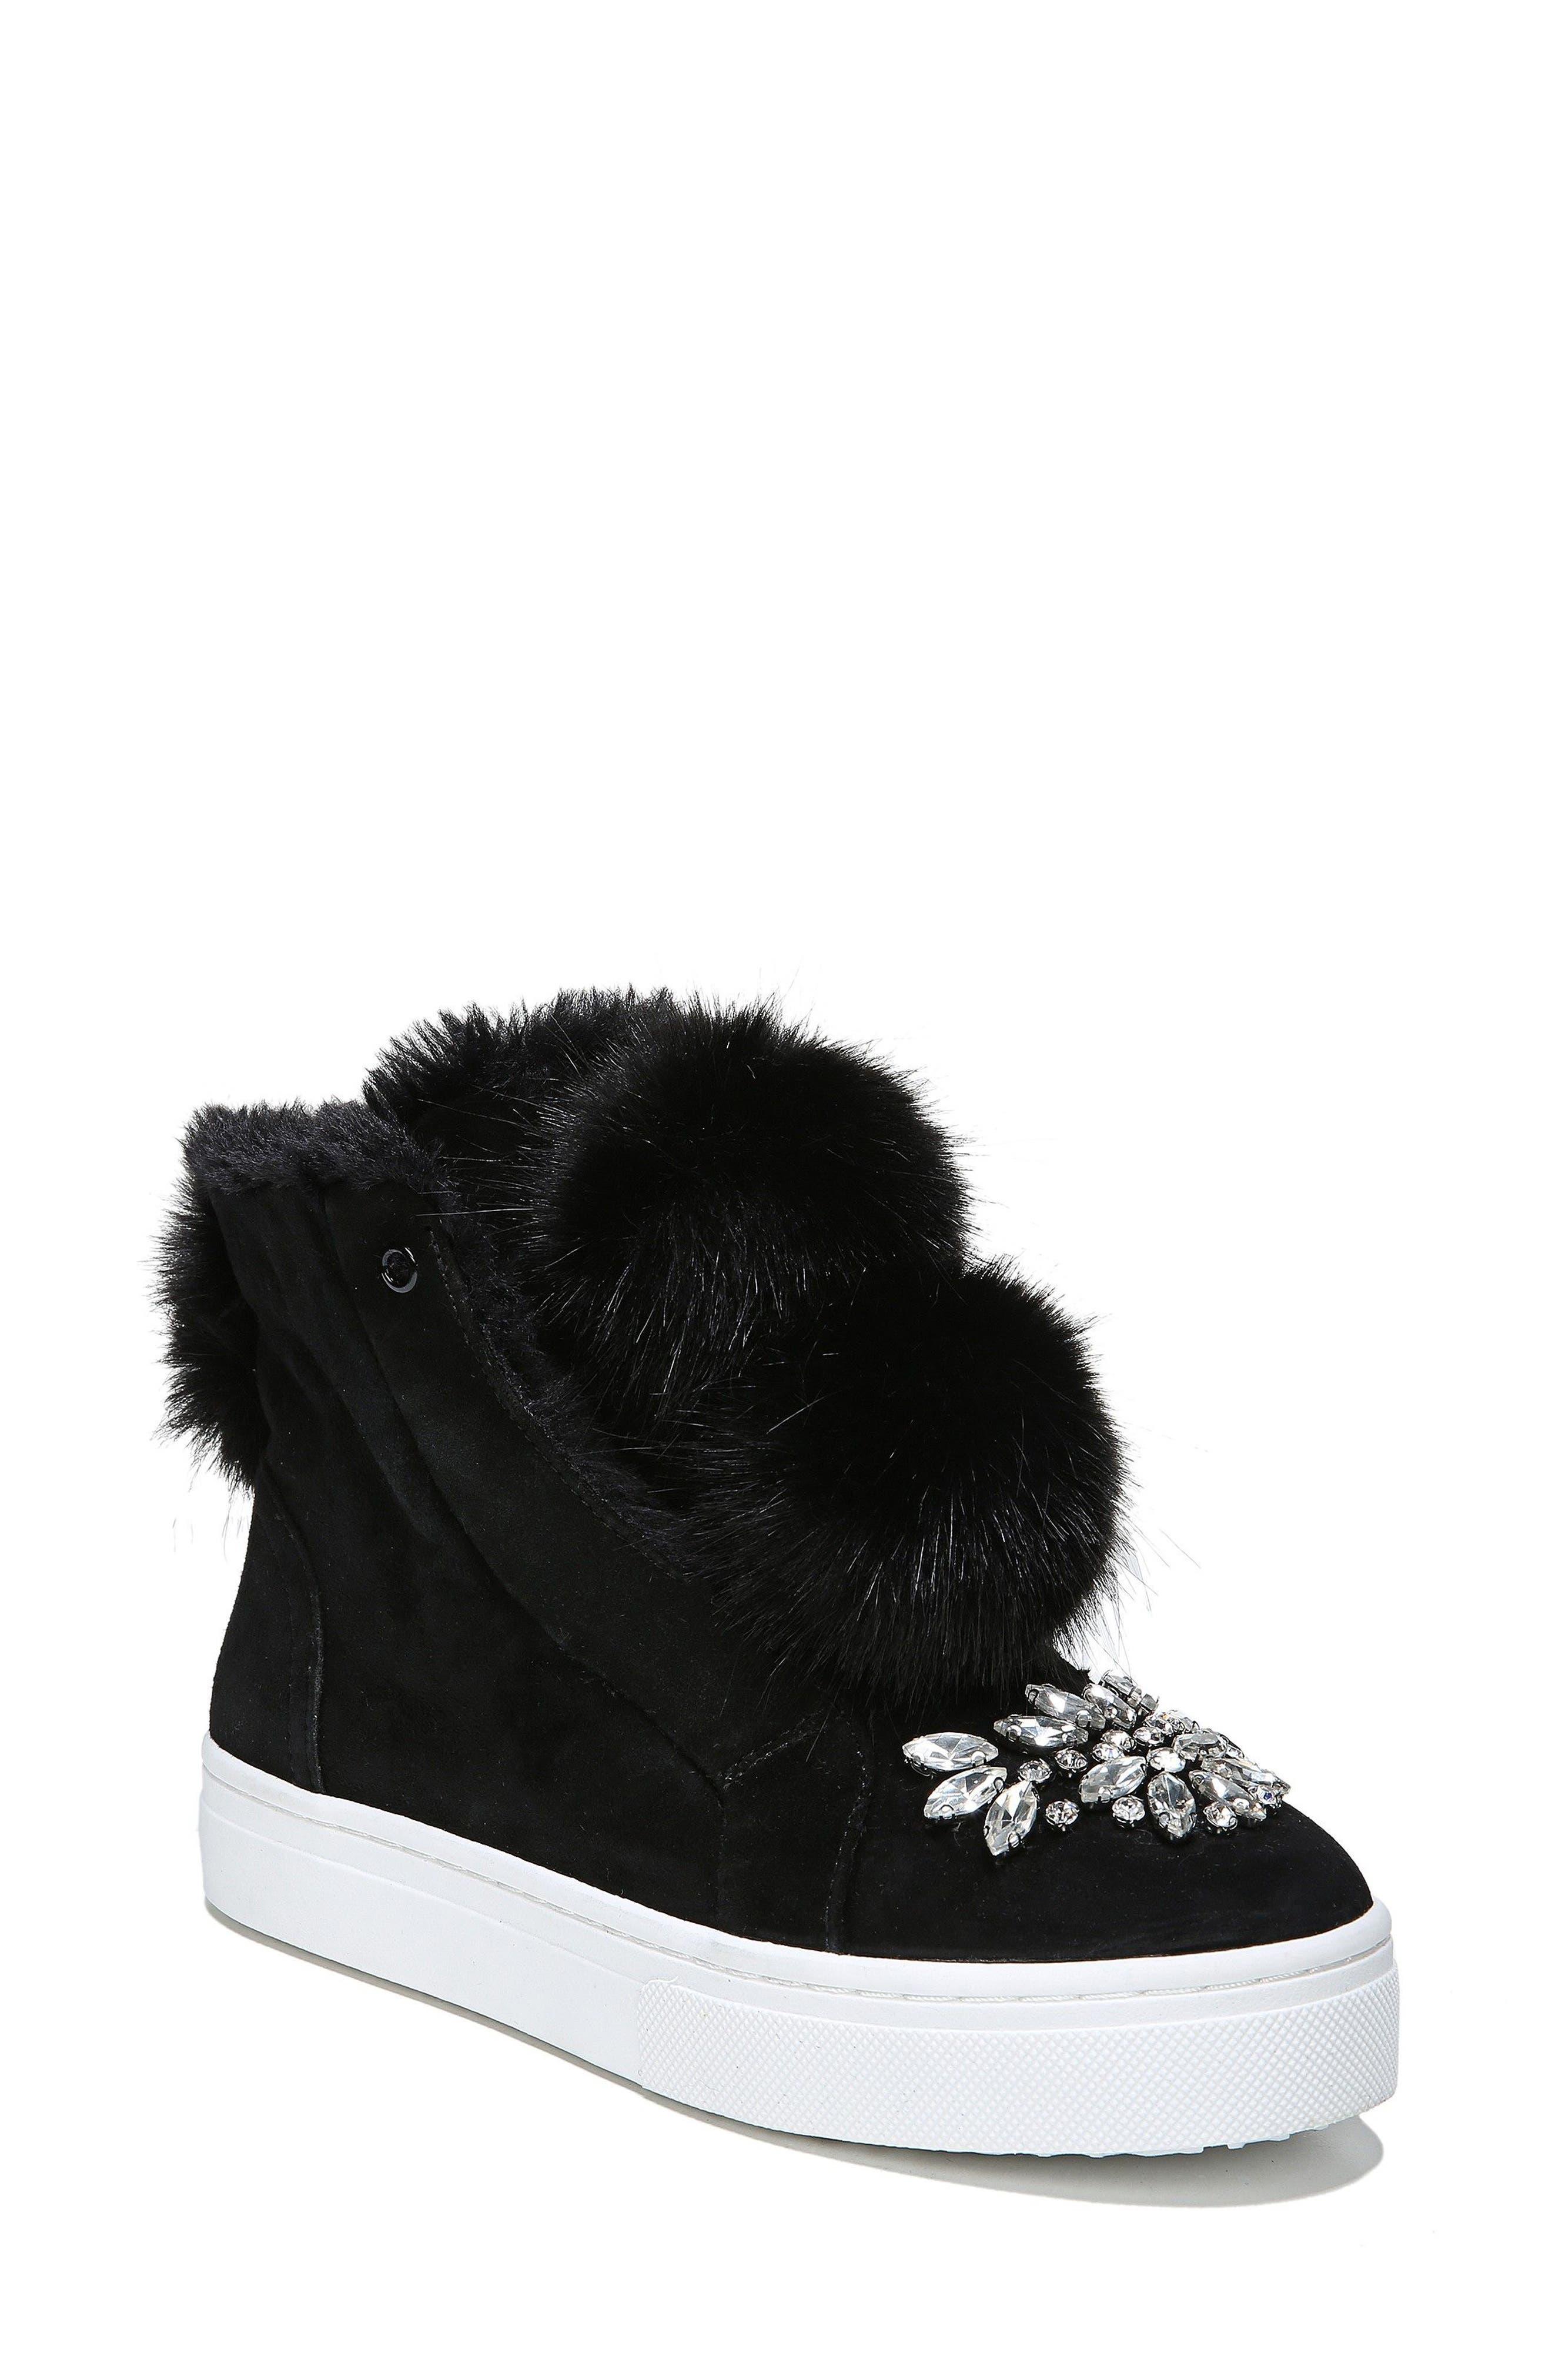 Leland Faux Fur Sneaker,                             Main thumbnail 1, color,                             001